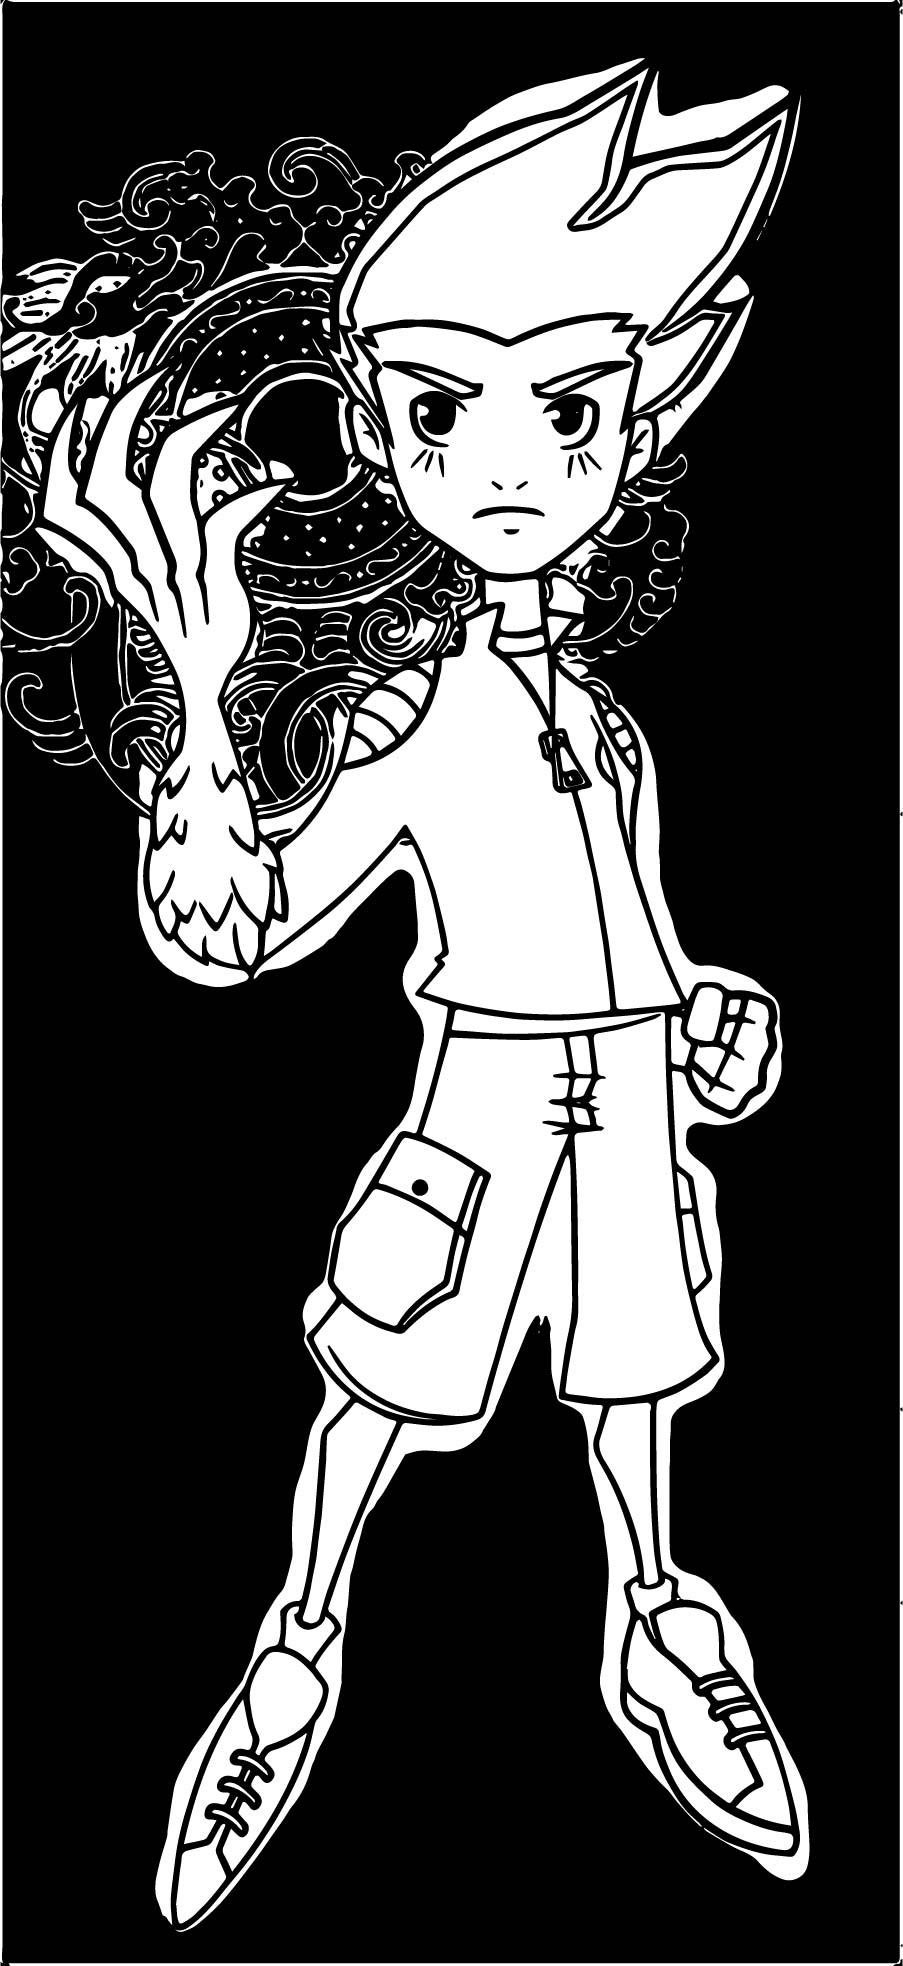 American Dragon Jake Long Black Power Coloring Page